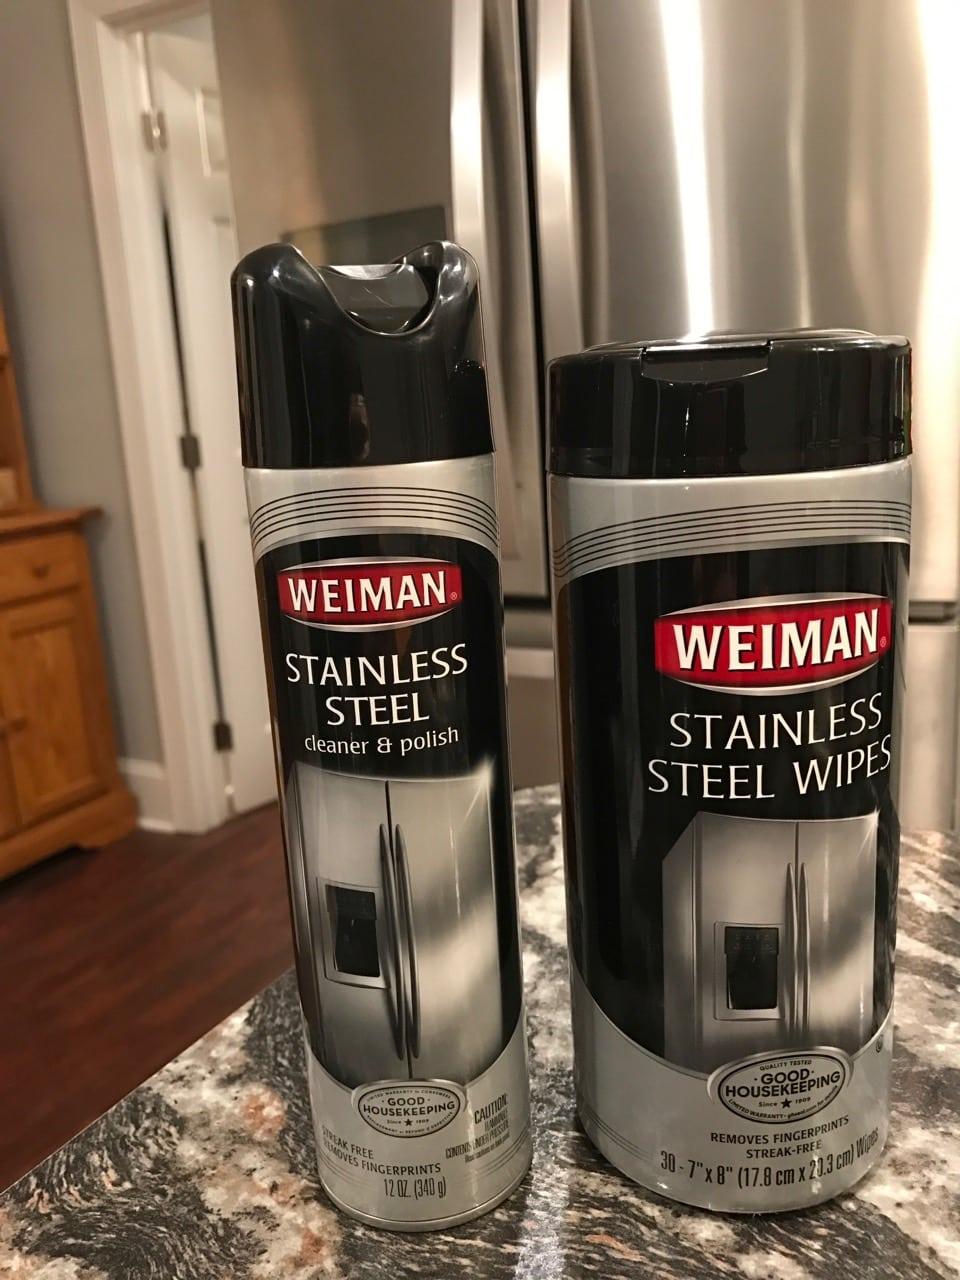 Weiman Stainless Steel polish